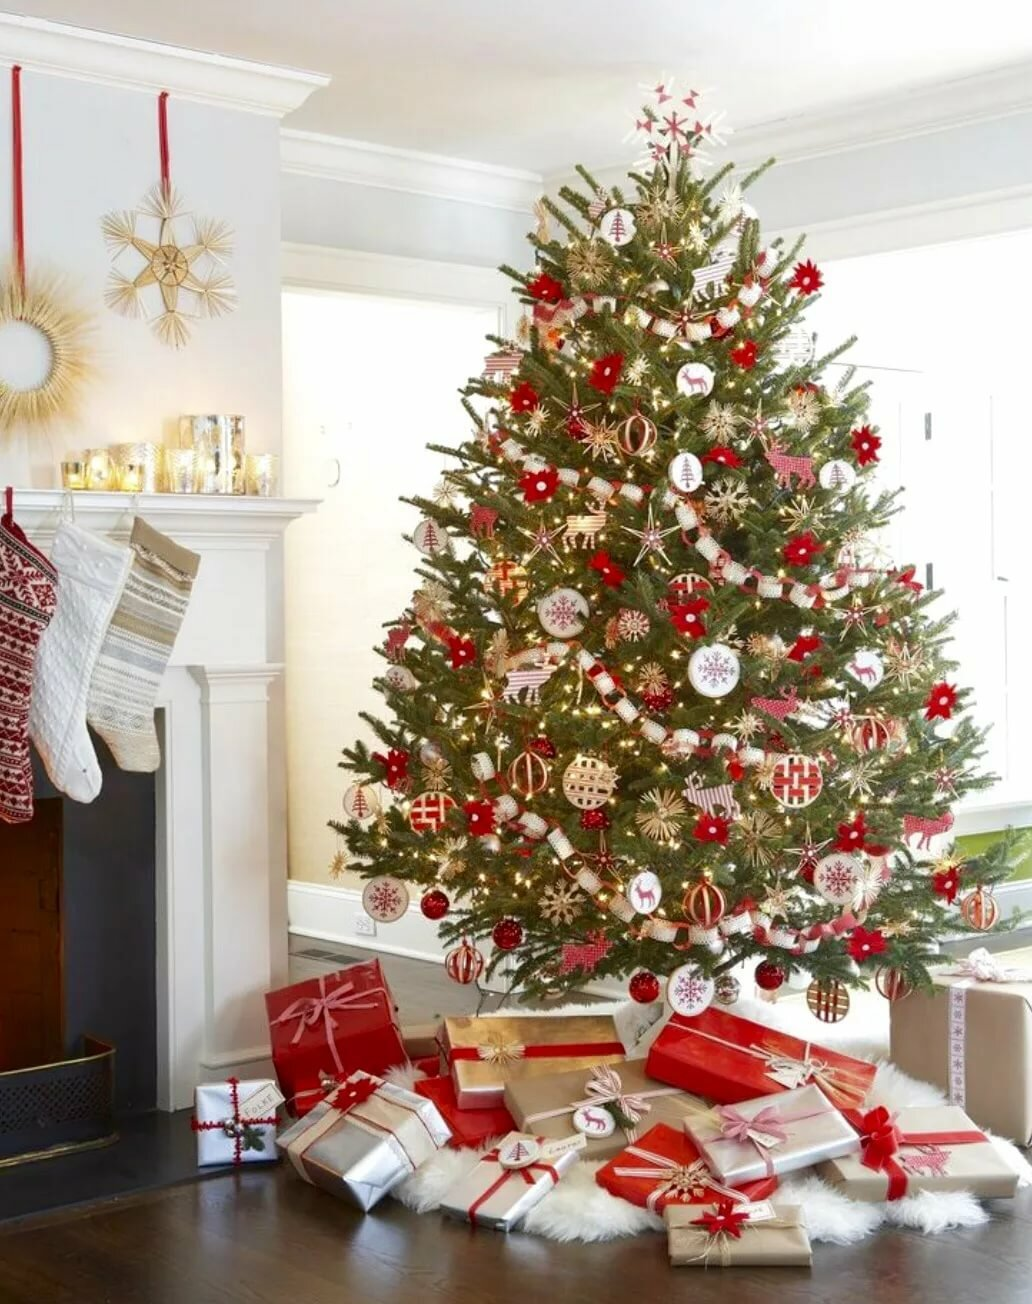 бело красная елка фото пластинку записал уже